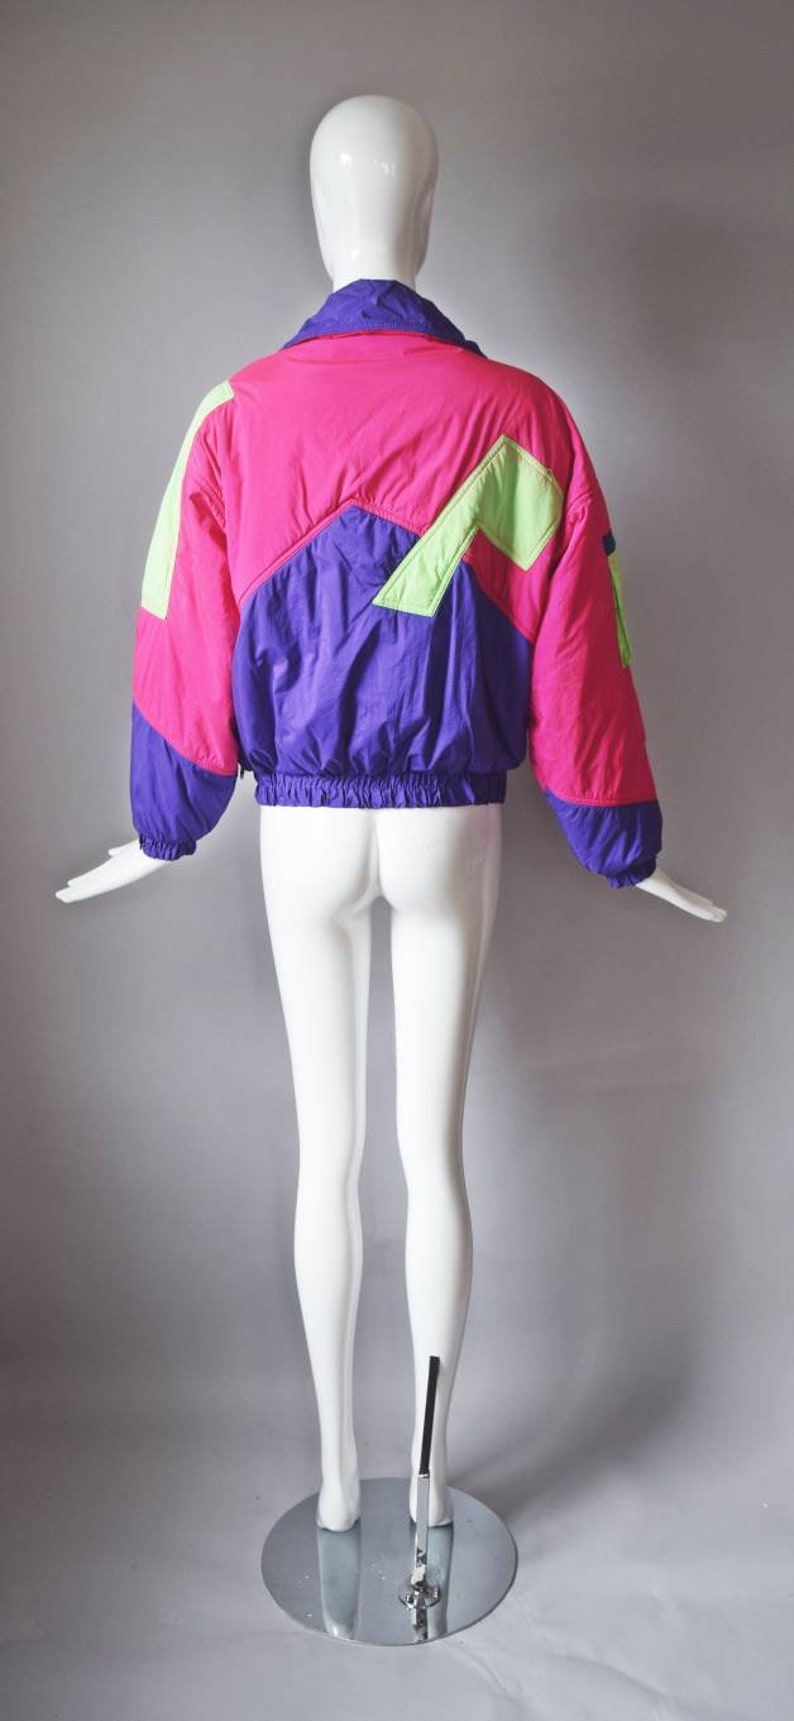 pockets high neck nylon zip up casual 1990s streetwear colorful vtg 90s CB Sports hot pink neon green colorblock winter ski coat jacket